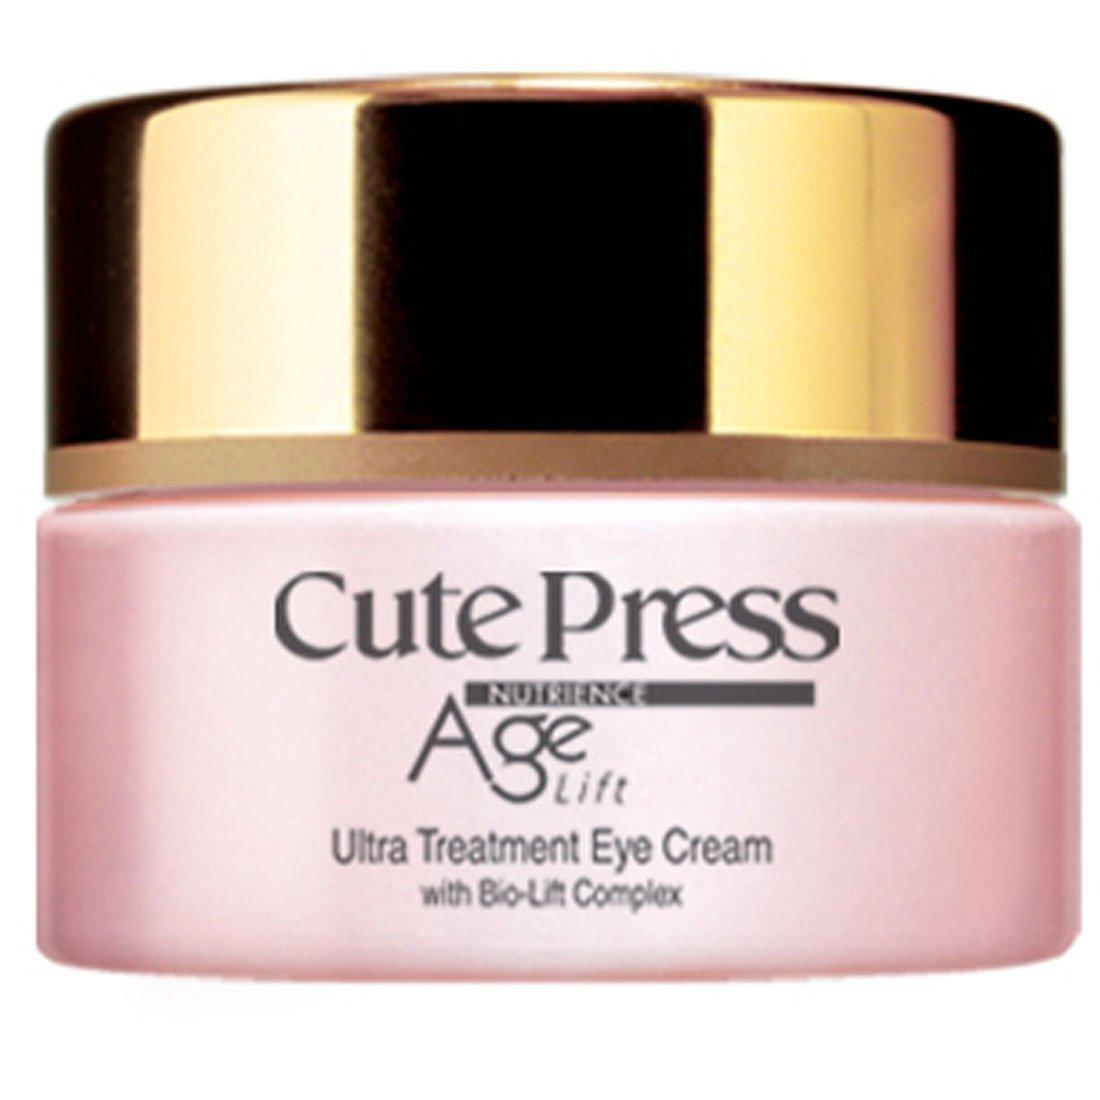 Cutepress Nutrience Age Lift Ultra Treatment Eye Cream